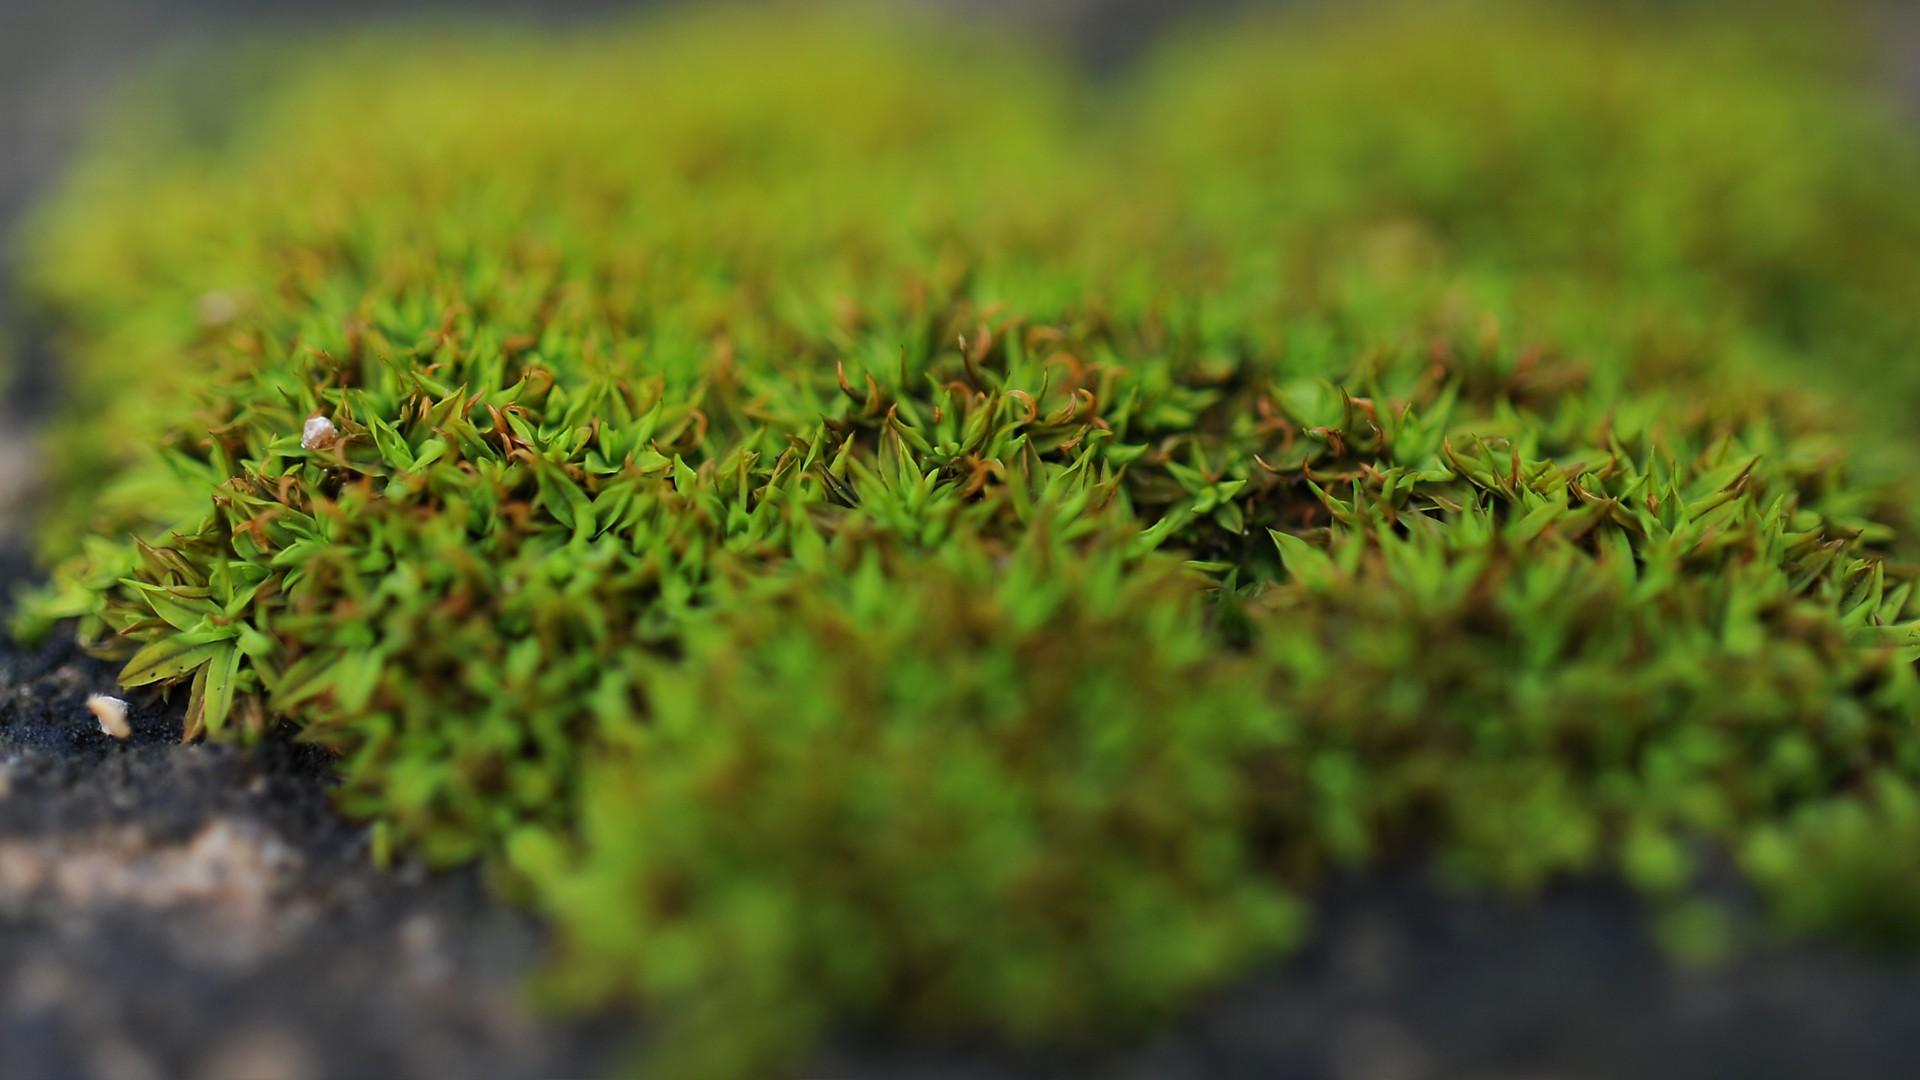 Fondos de pantalla naturaleza c sped musgo verde for Tierra suelo wallpaper